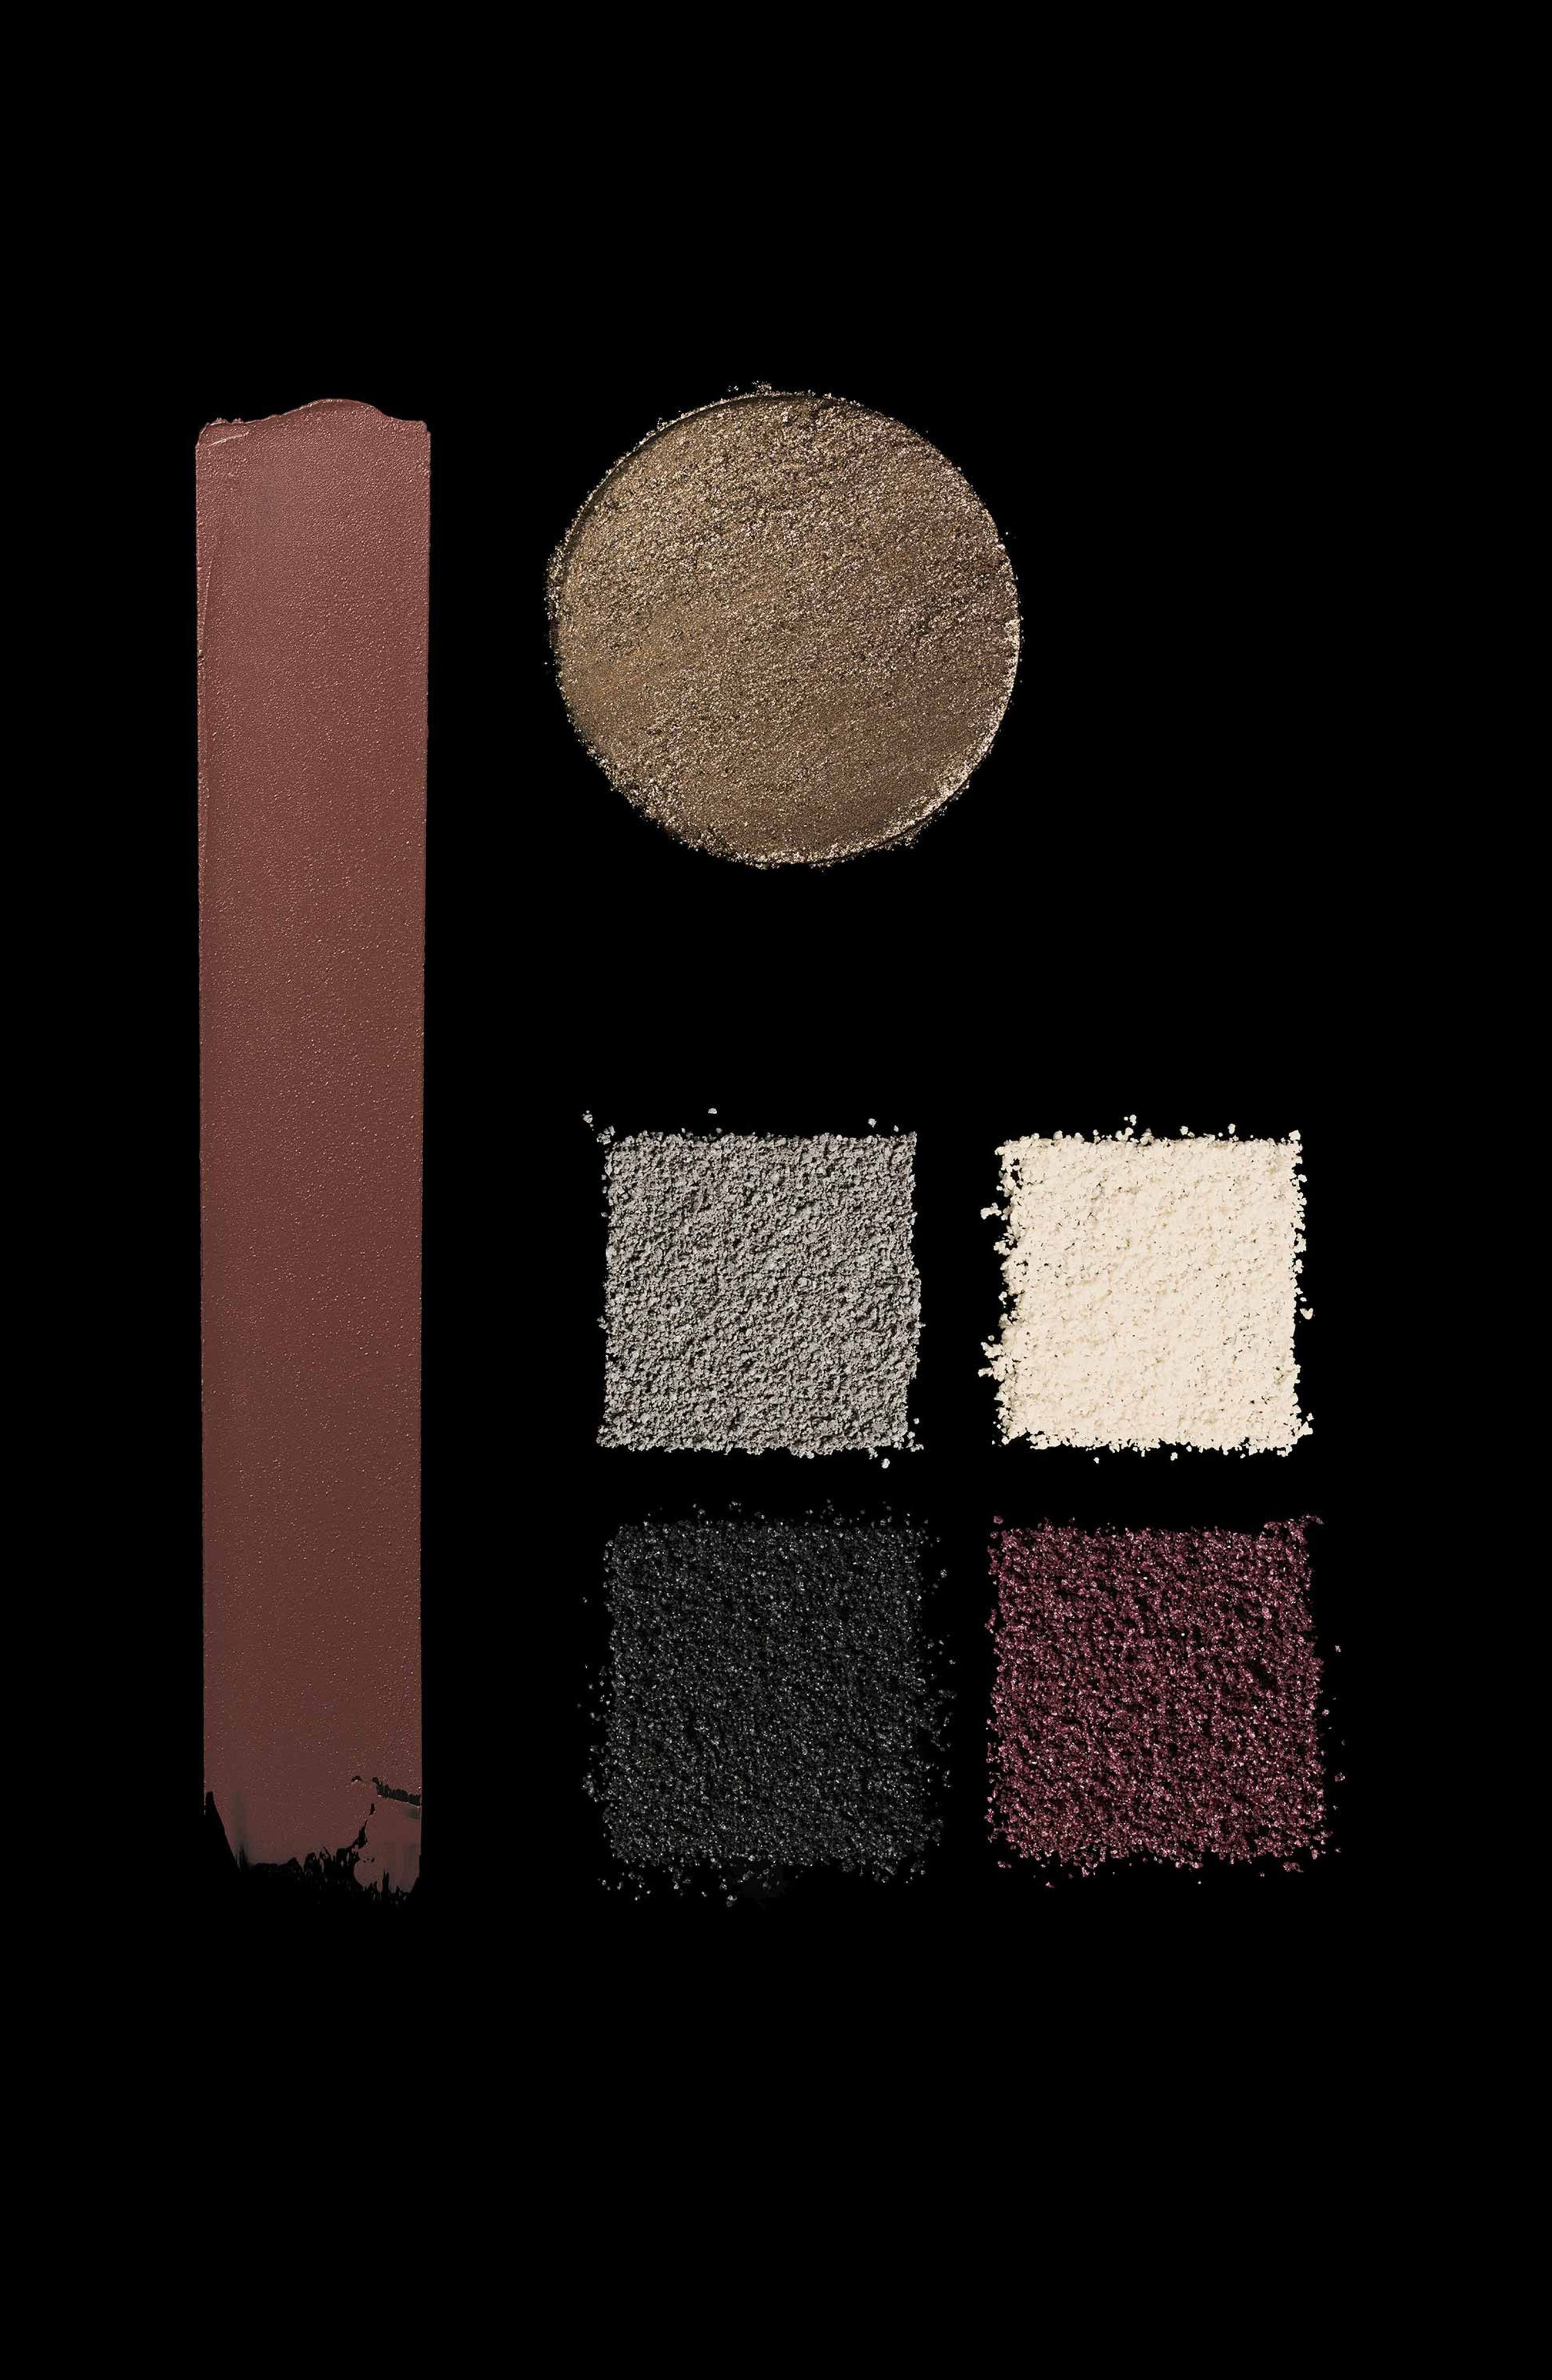 Victoria Beckham Eye Kajal,                             Alternate thumbnail 12, color,                             Black Saffron/ Vanille